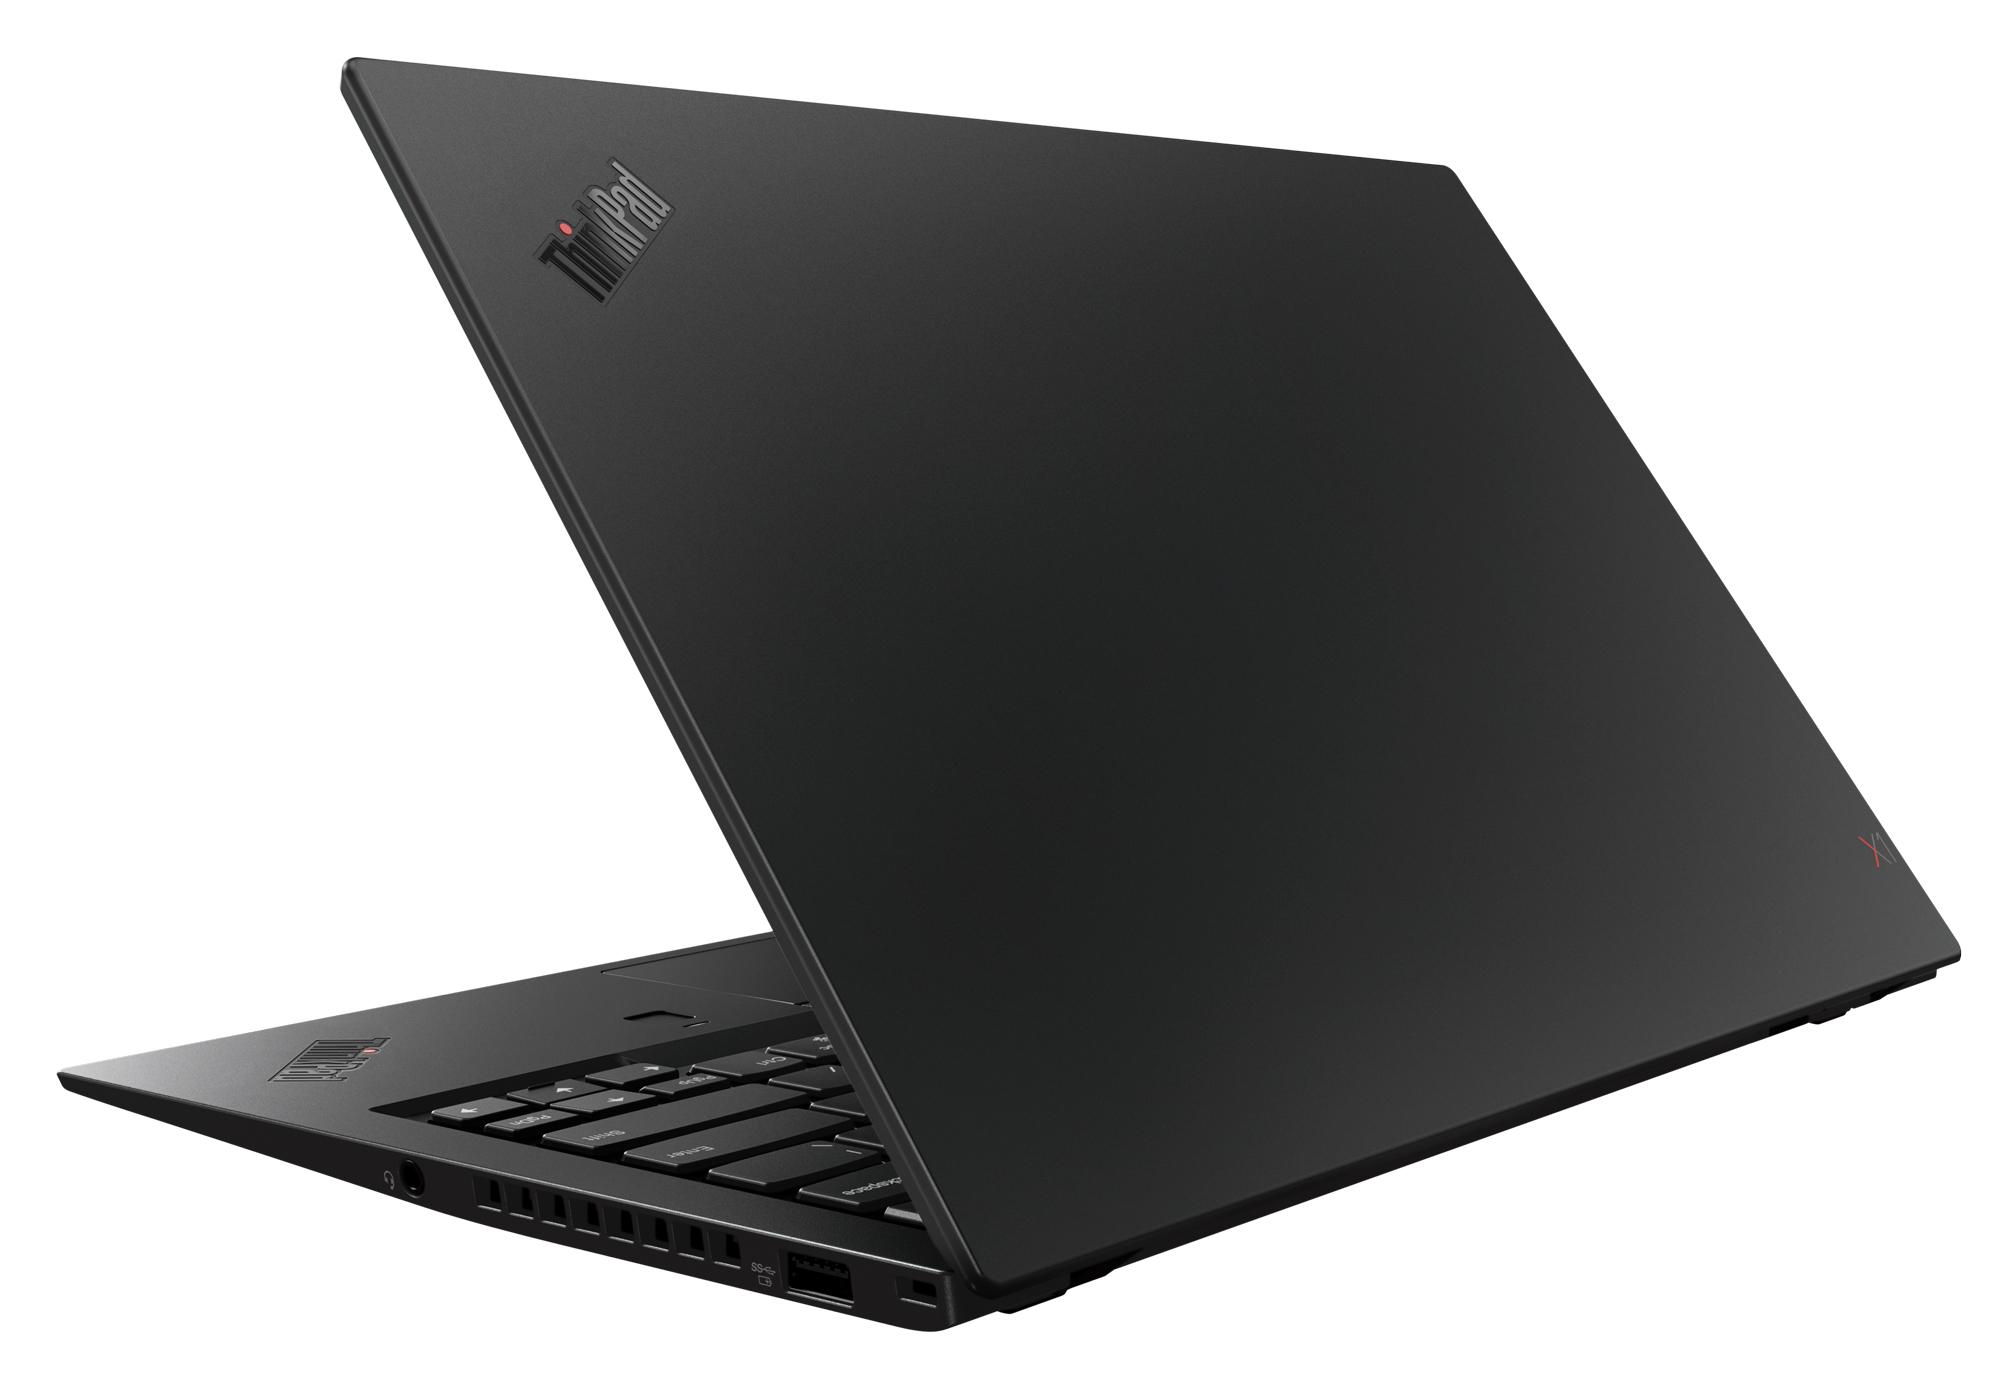 Фото  Ультрабук ThinkPad X1 Carbon 6th Gen (20KH0081RT)